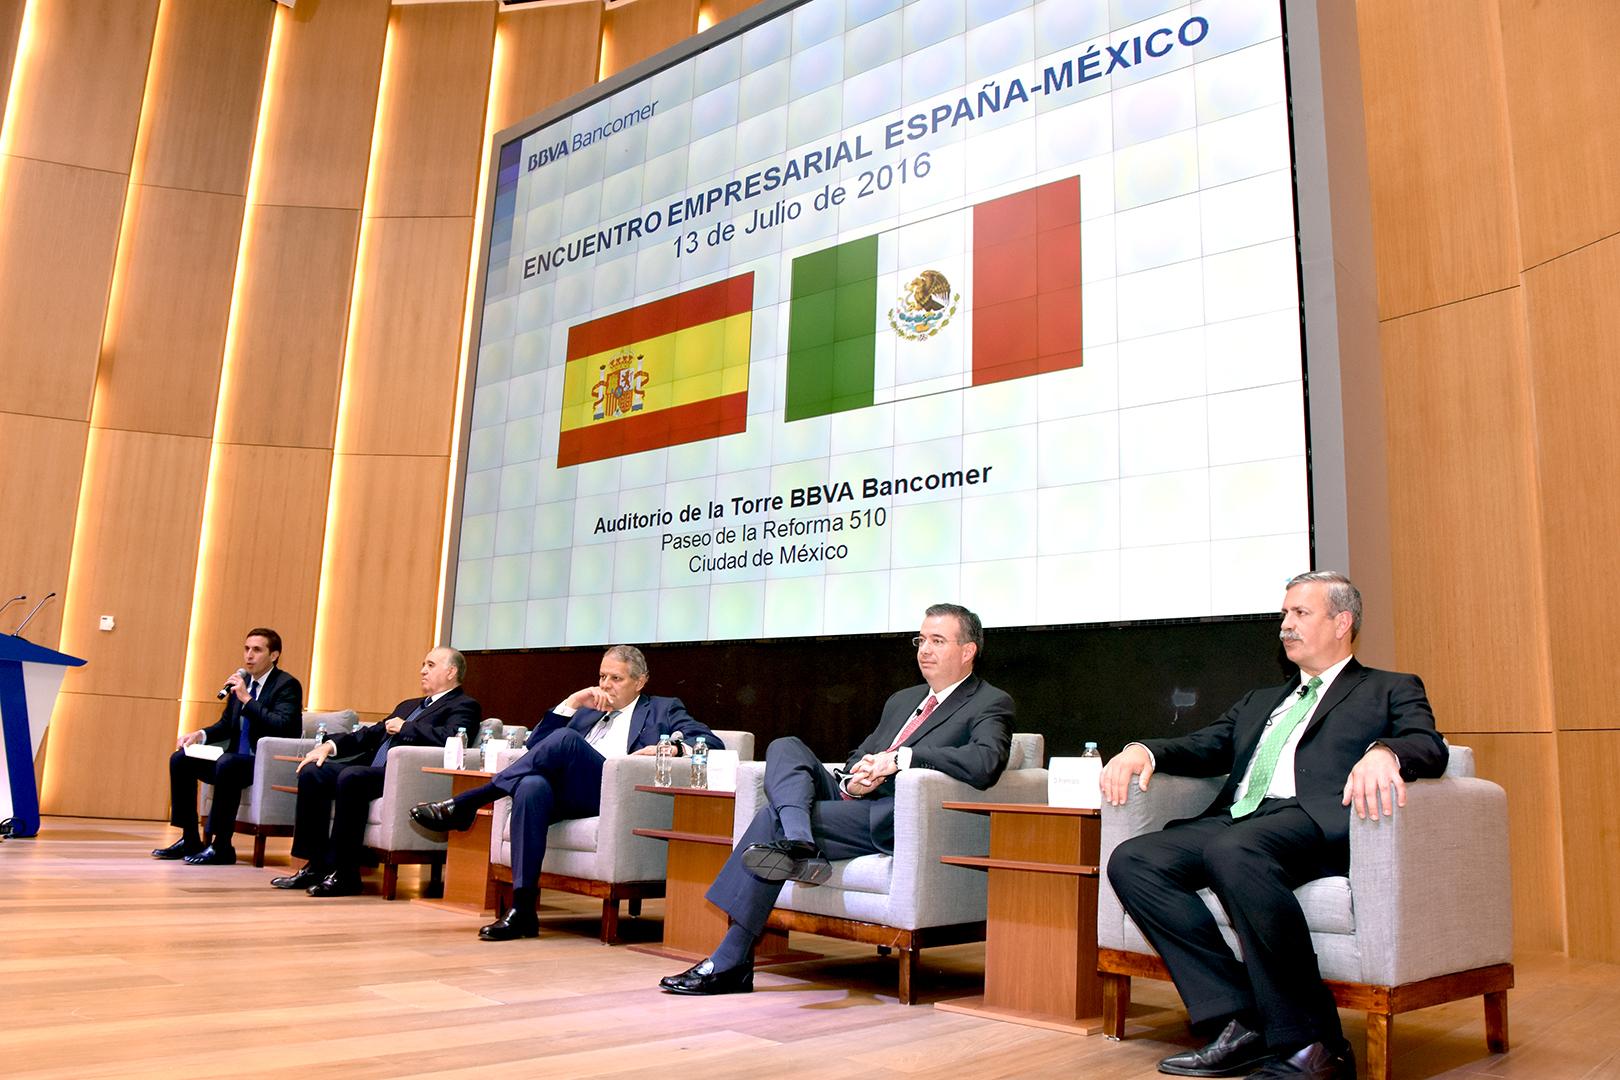 Encuentro empresarial m xico espa a banco nacional de for Gobierno exterior